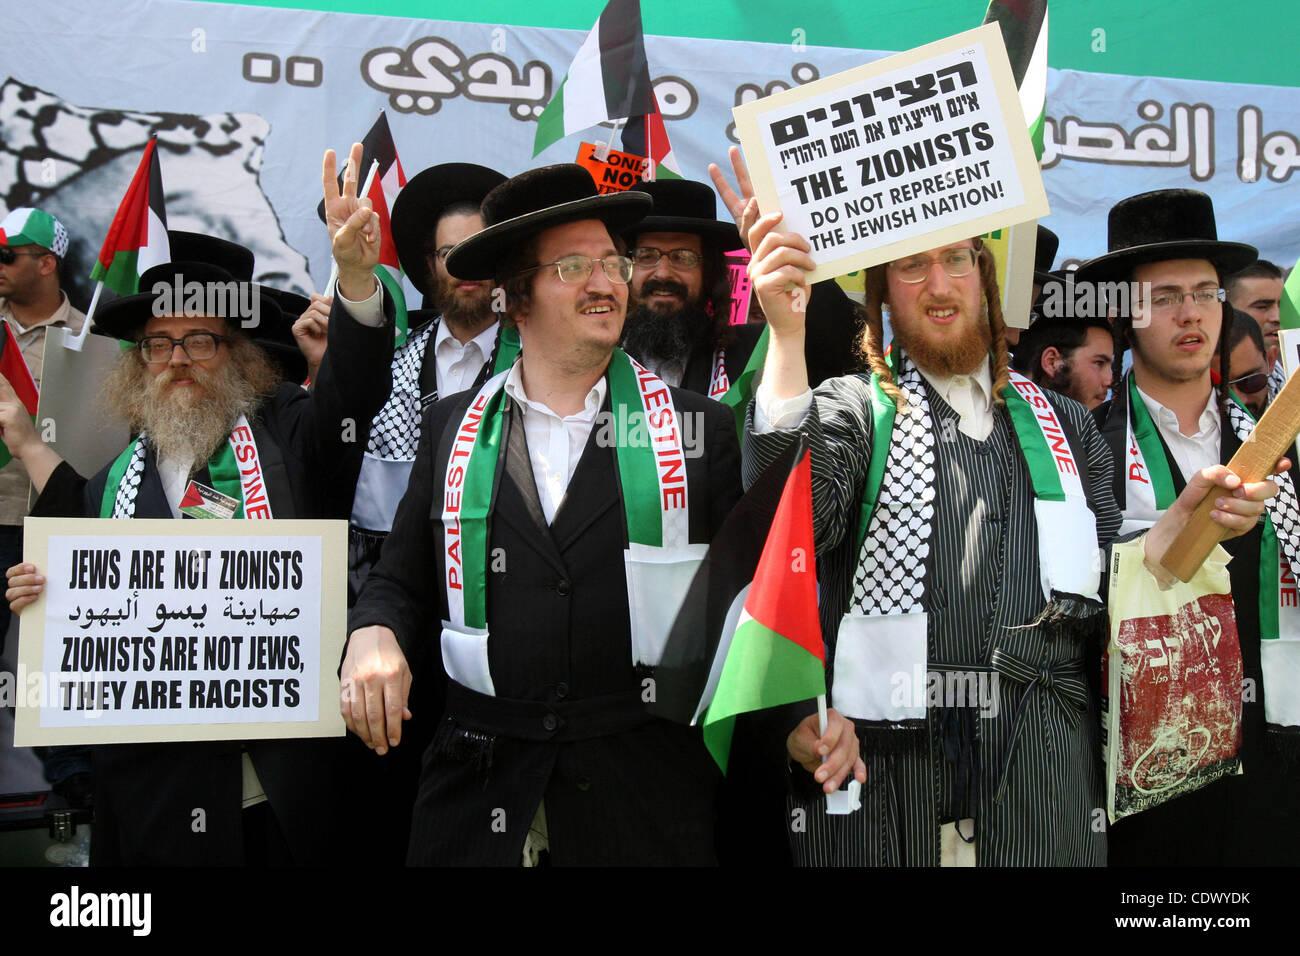 israel palestine karta Members of Neturei Karta, a small faction of ultra Orthodox Jews  israel palestine karta